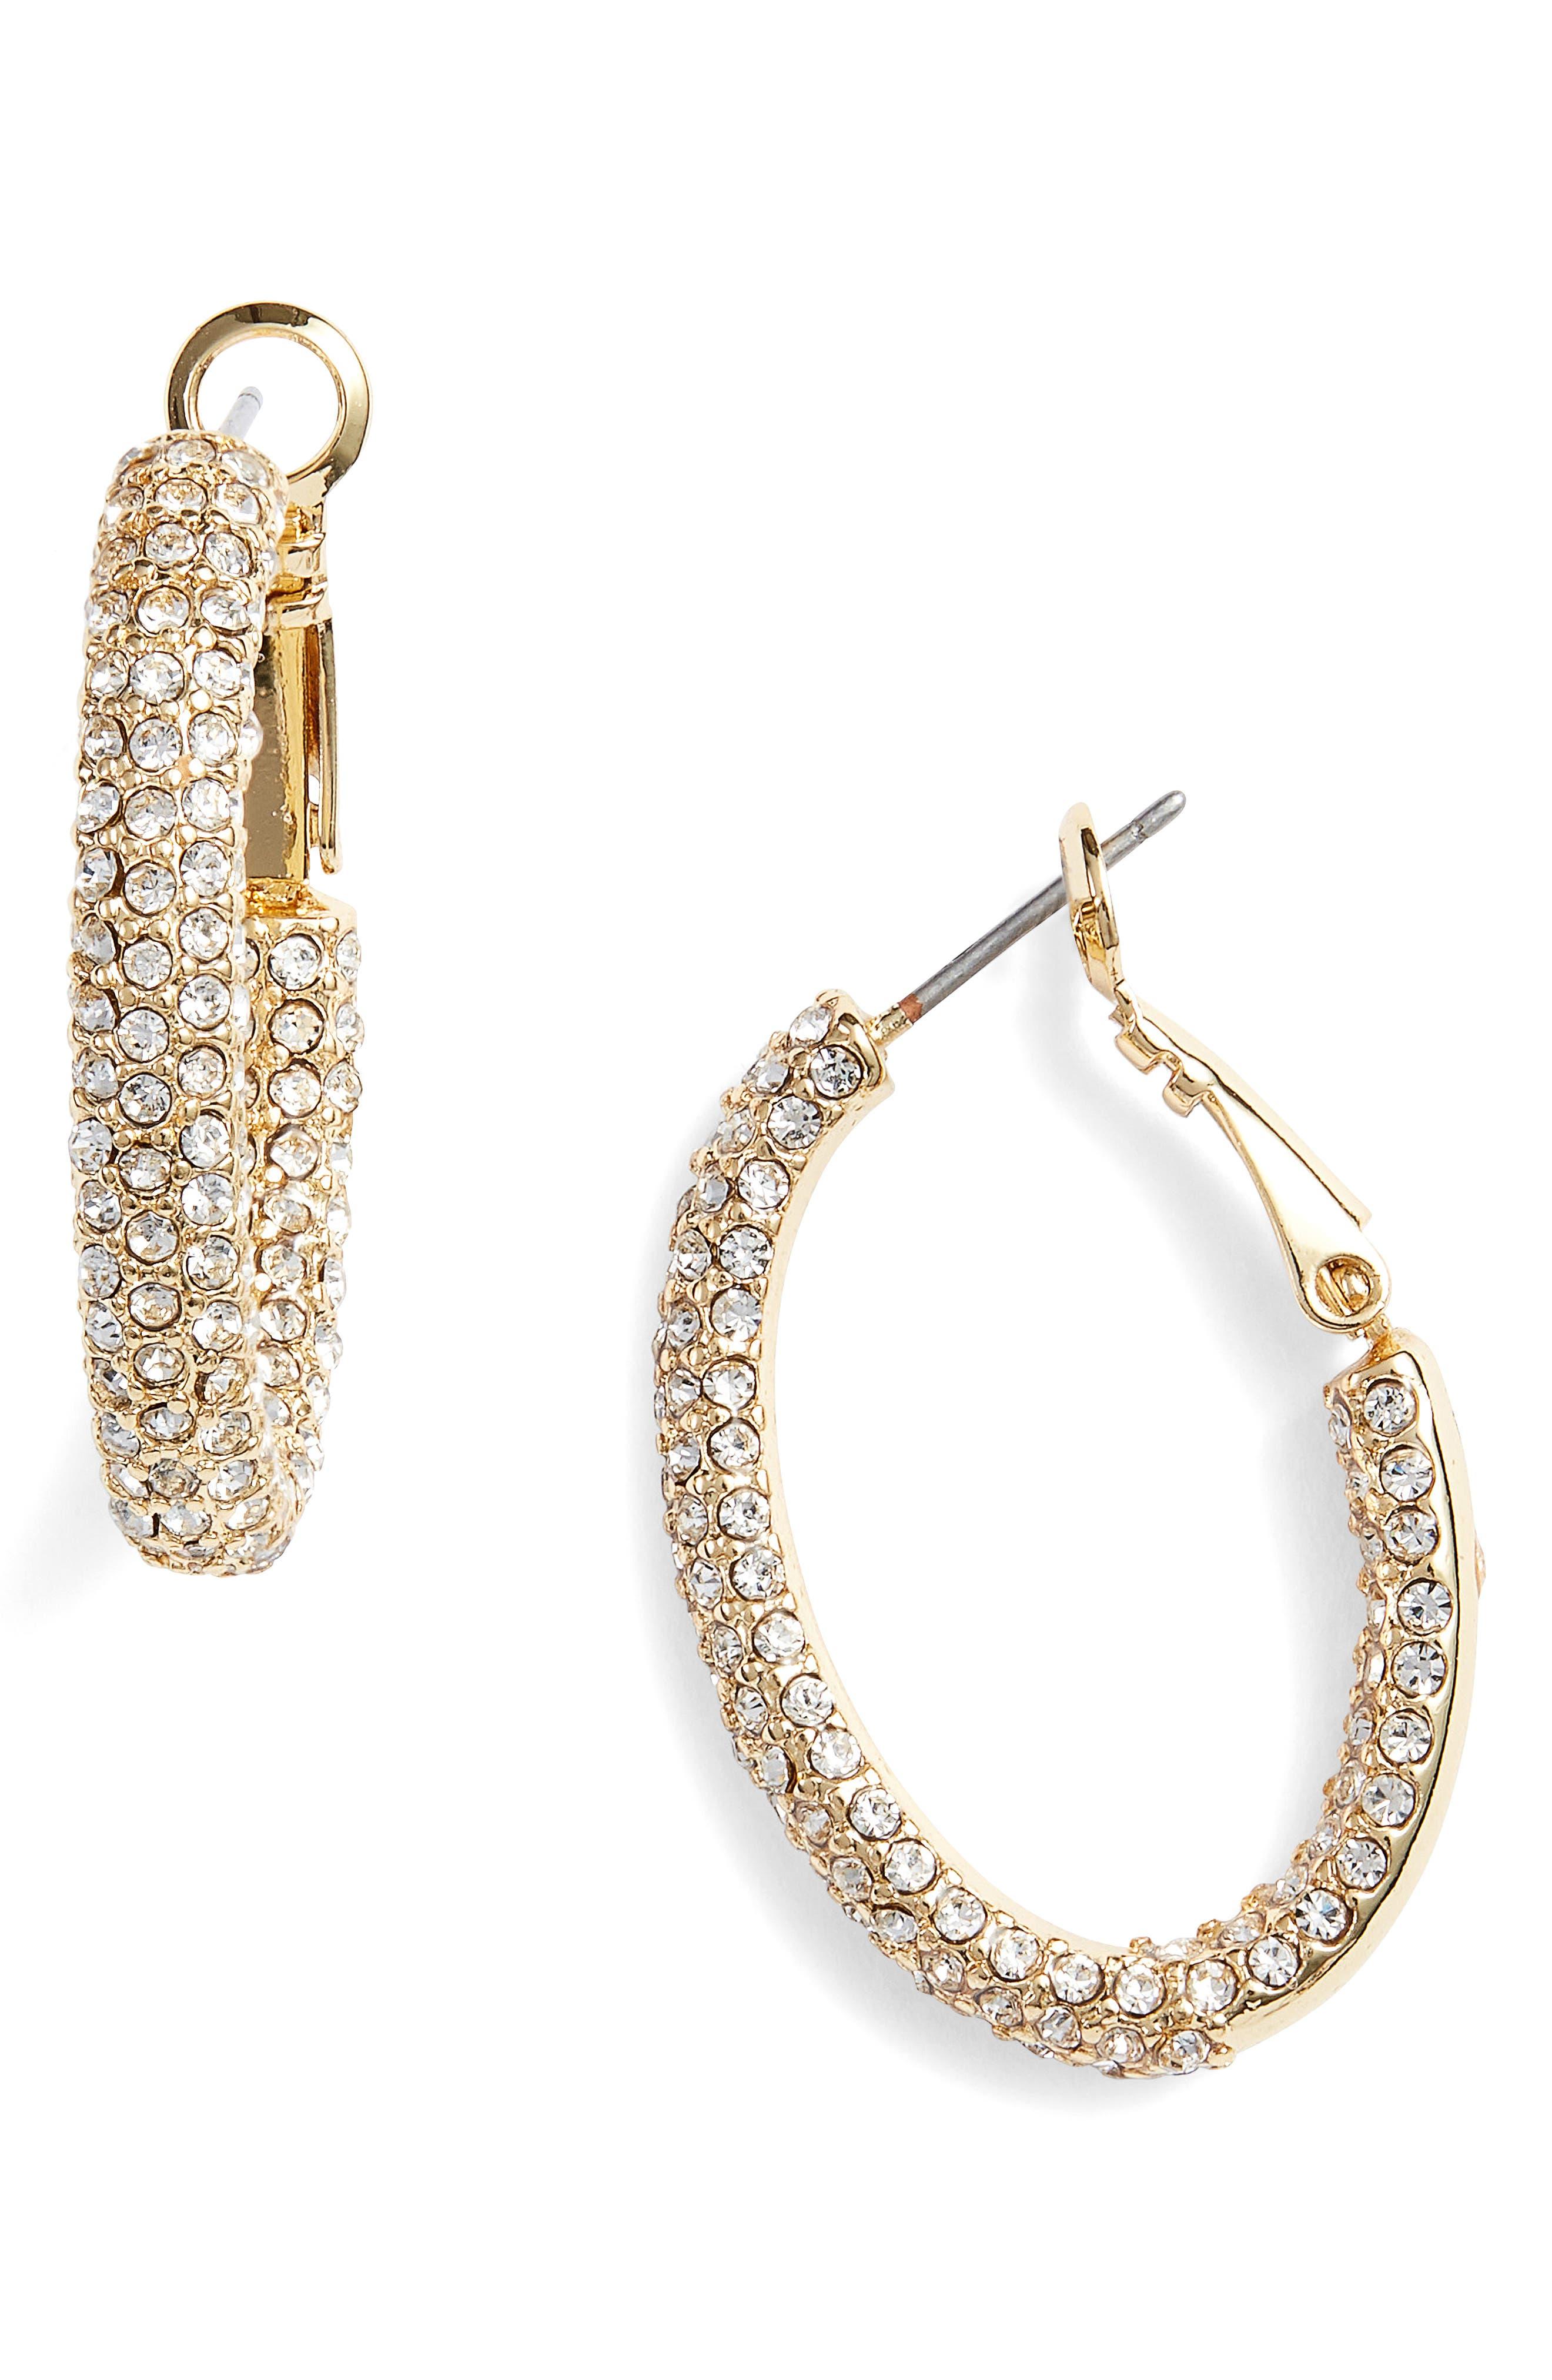 Vince Camuto Pavé Oval Hoop Earrings